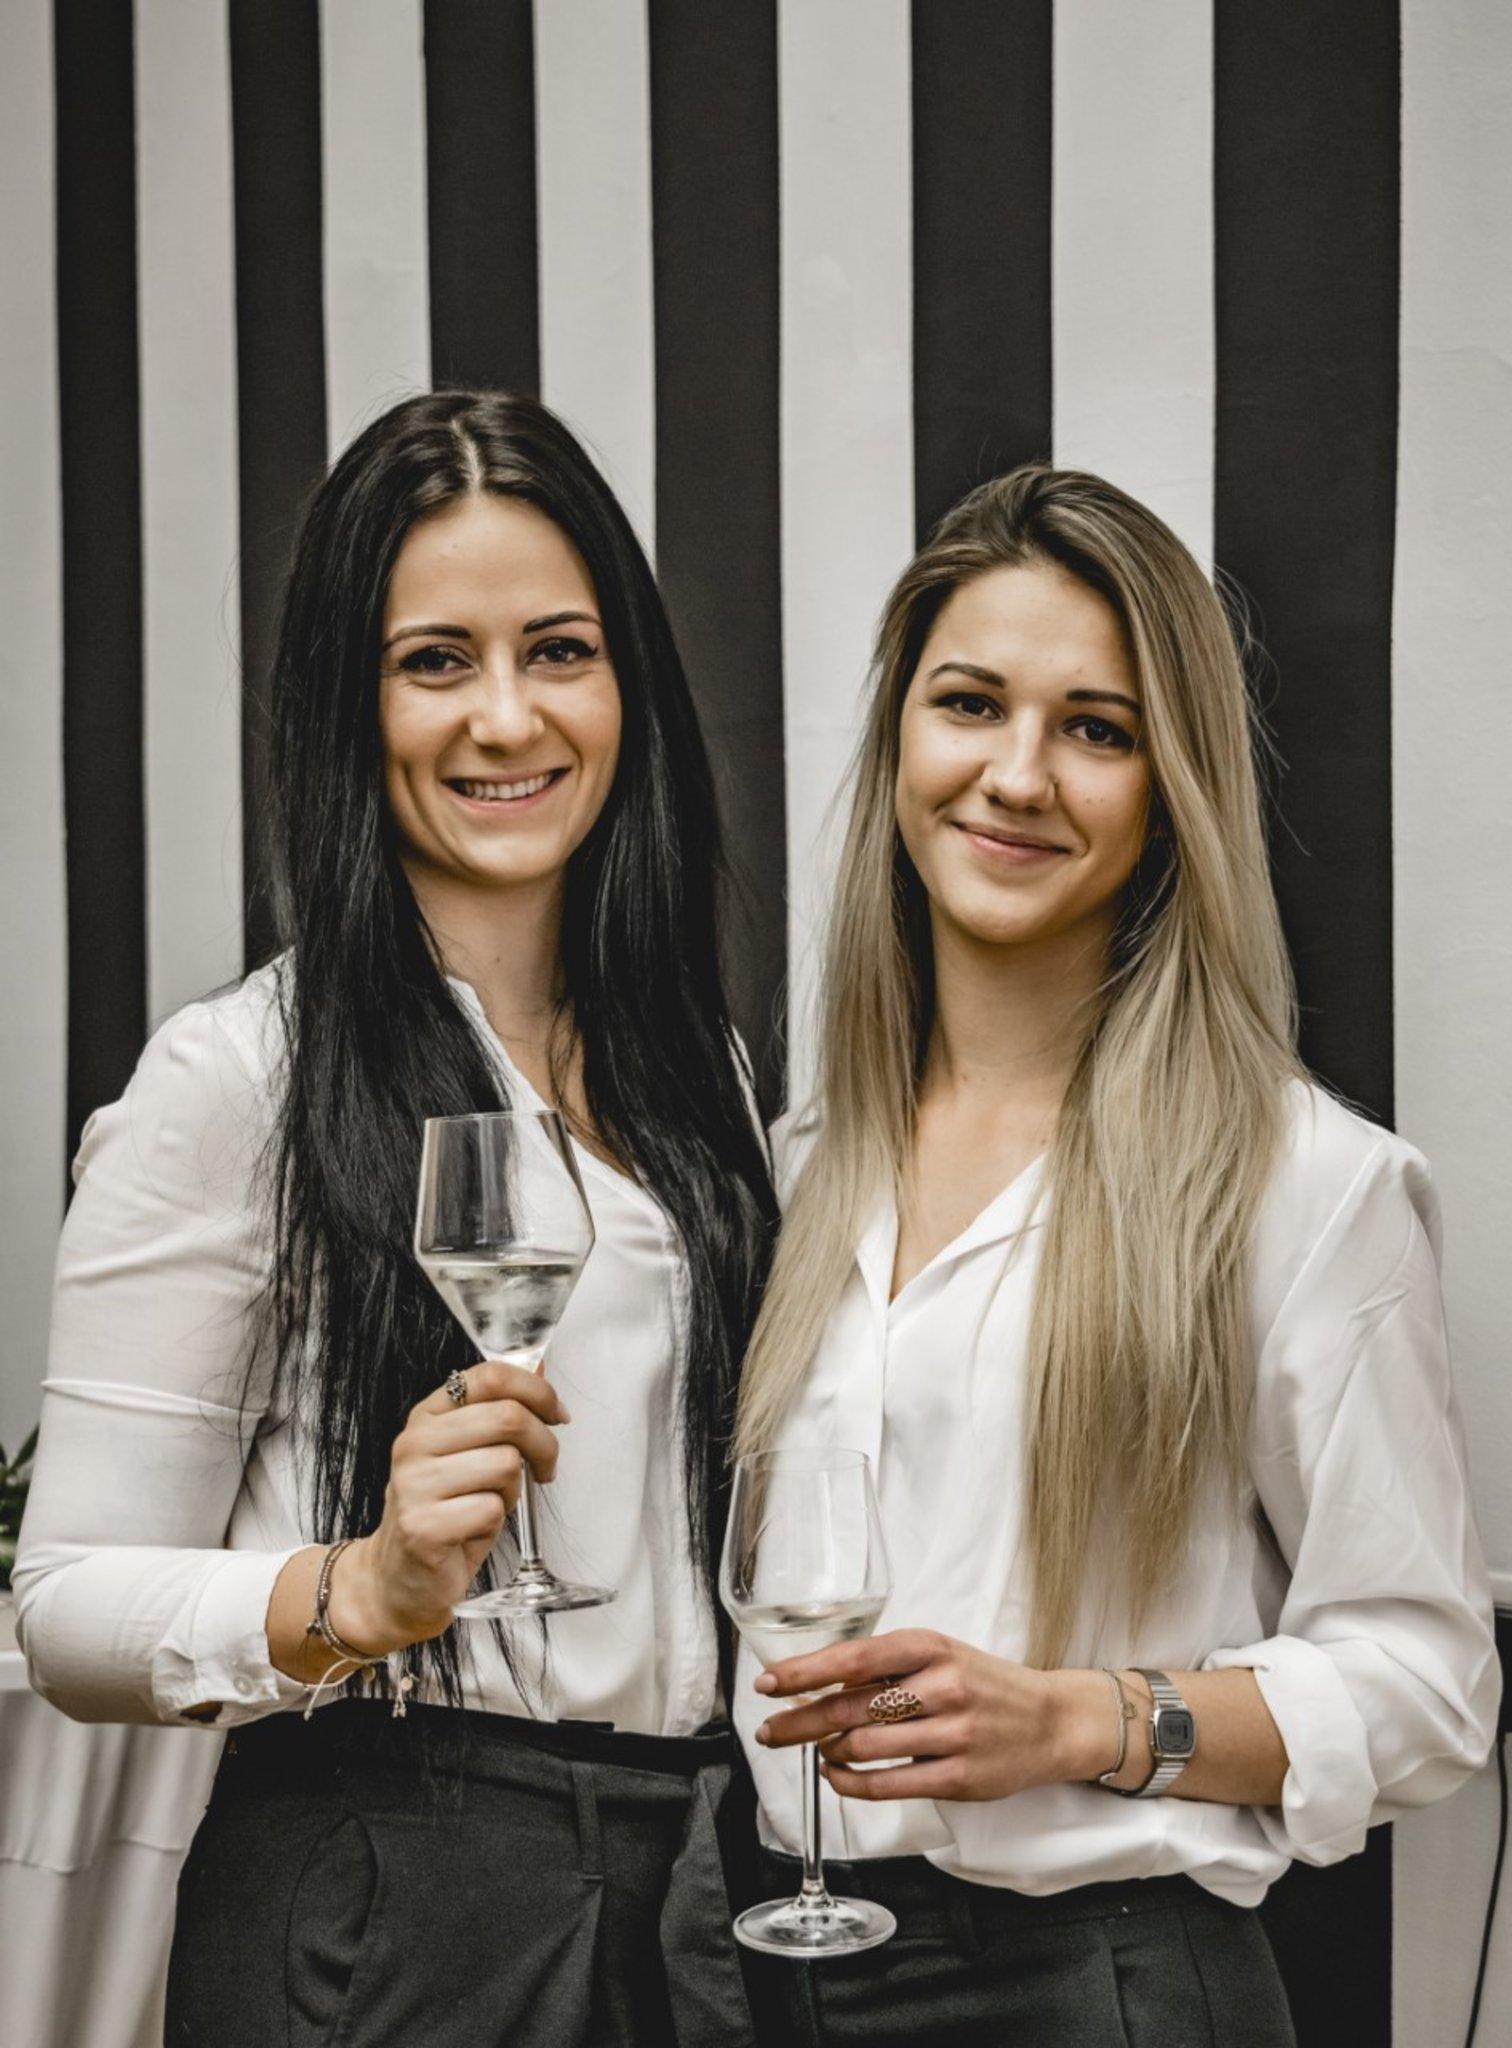 Raaba single frau, Sankt martin stadt kennenlernen